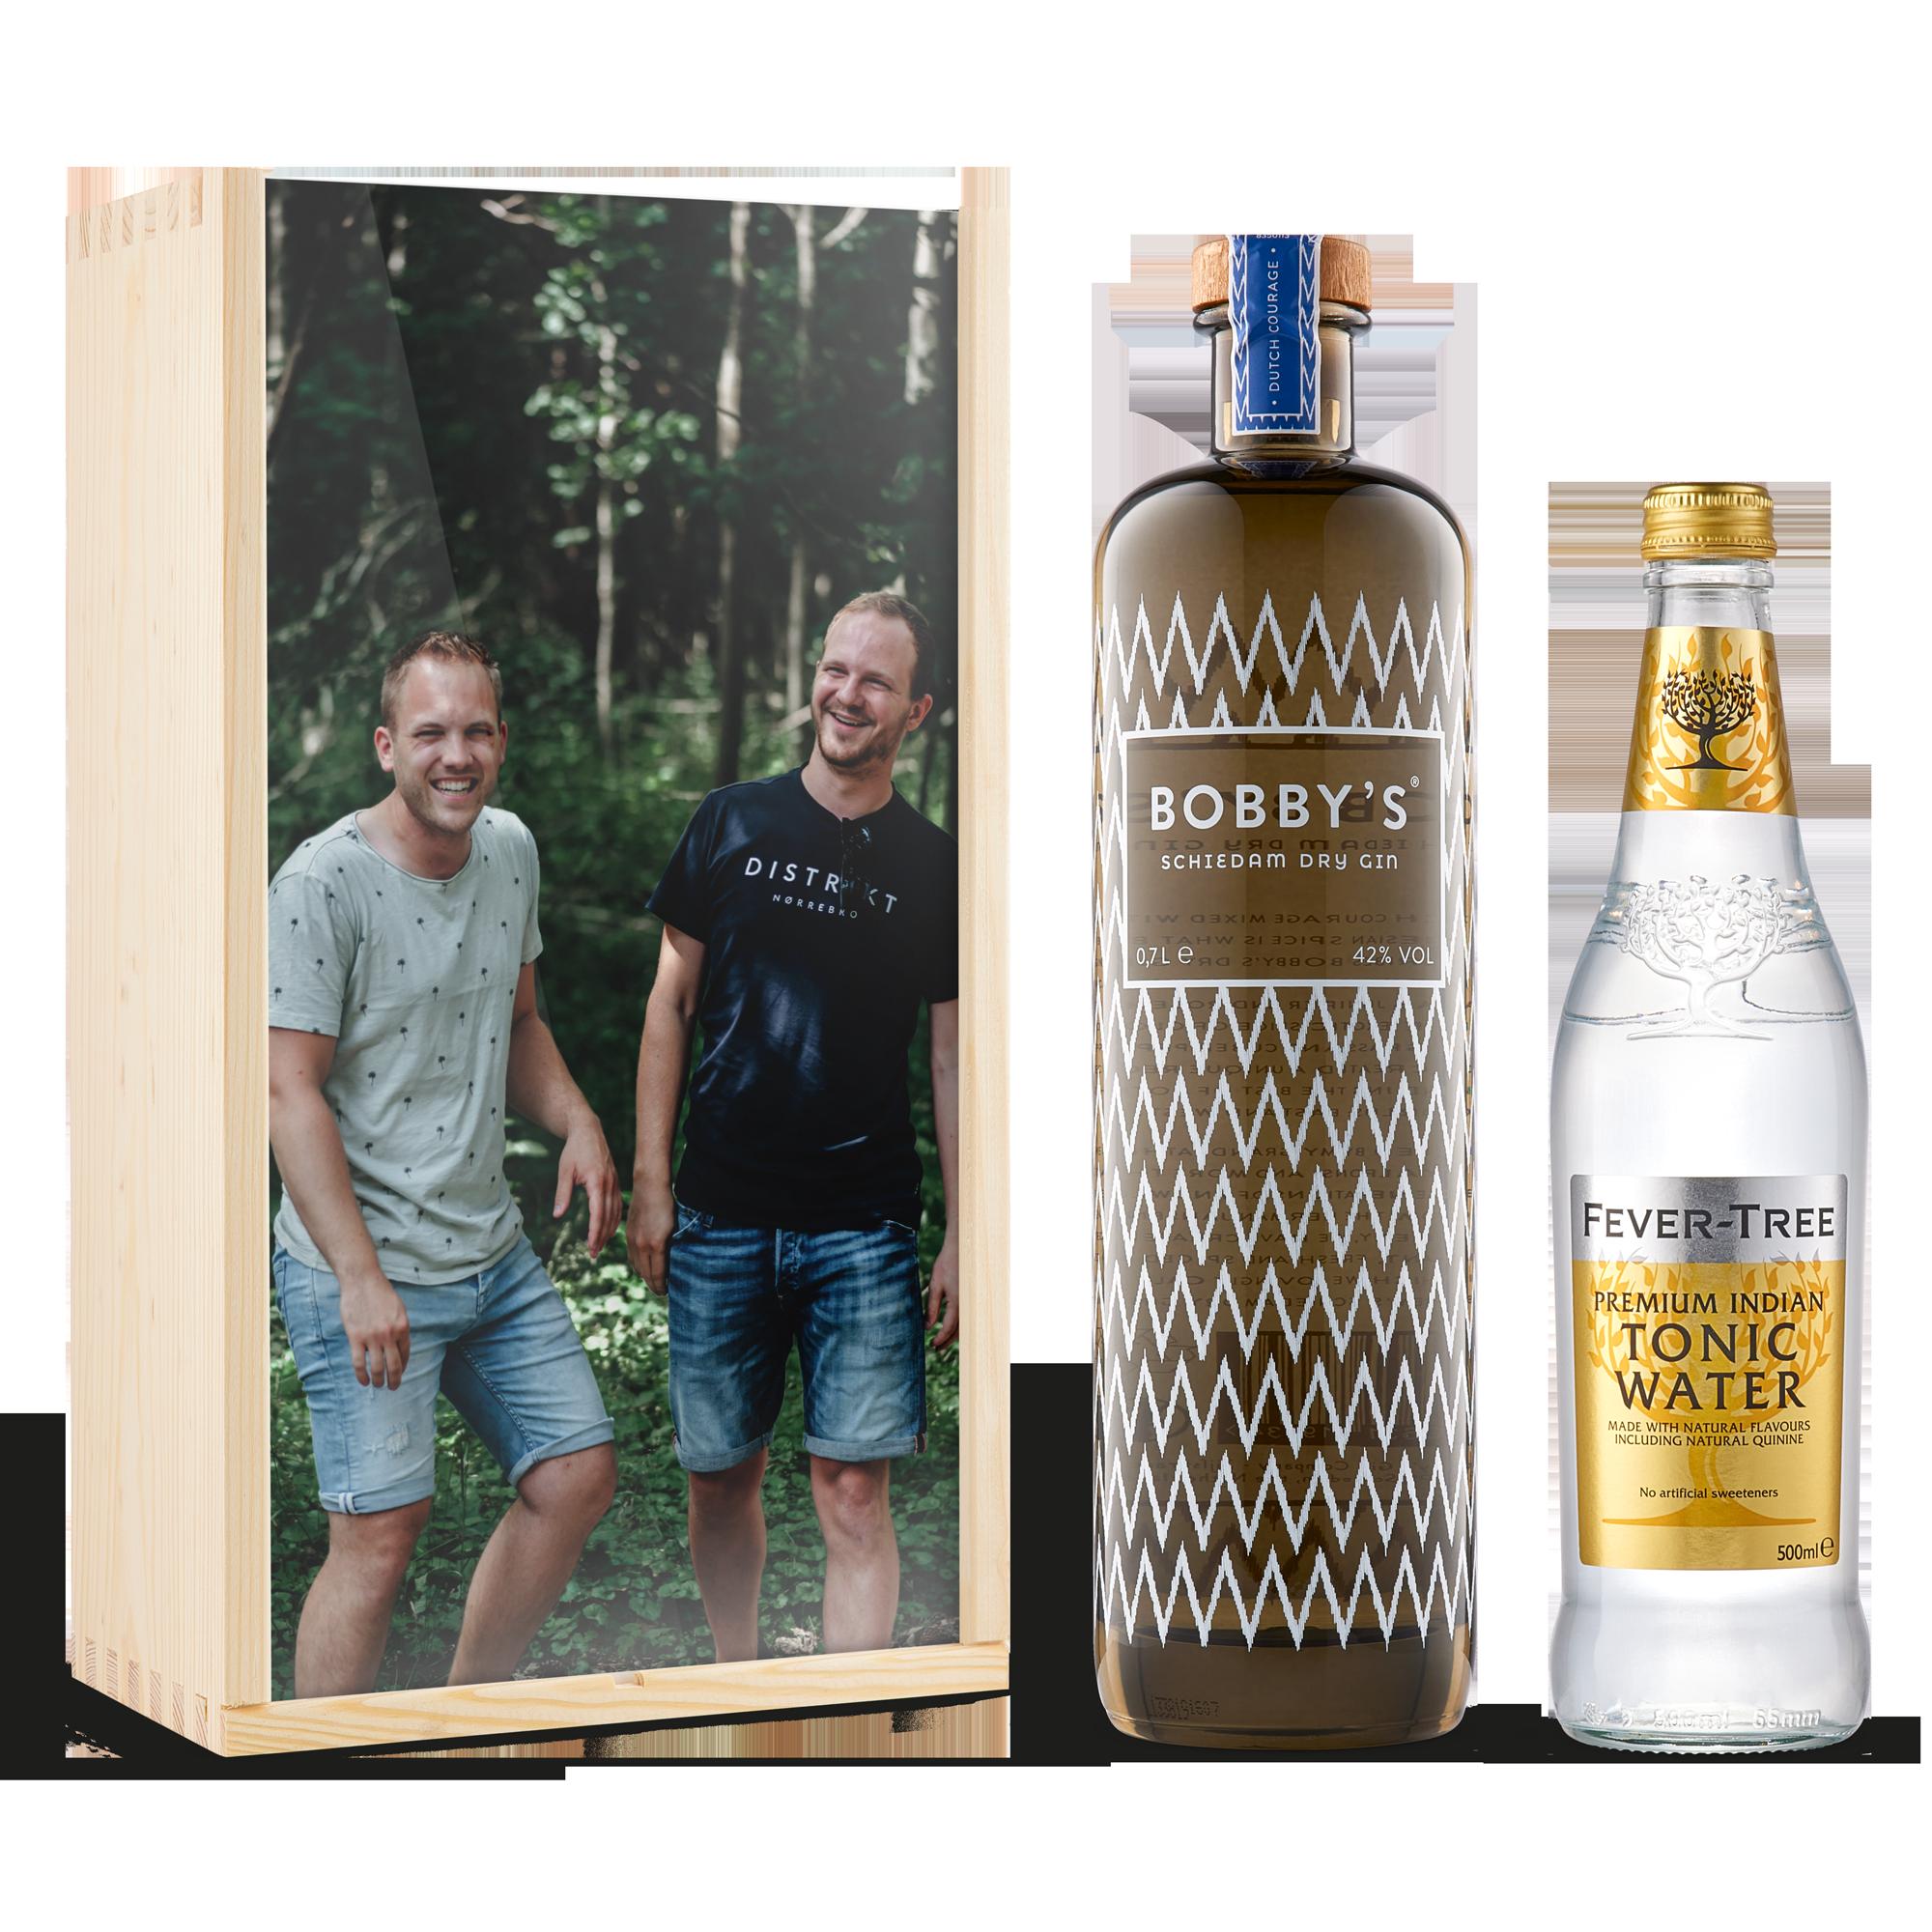 Gin-tonic pakket bedrukken - Bobby's gin (glanzende deksel)